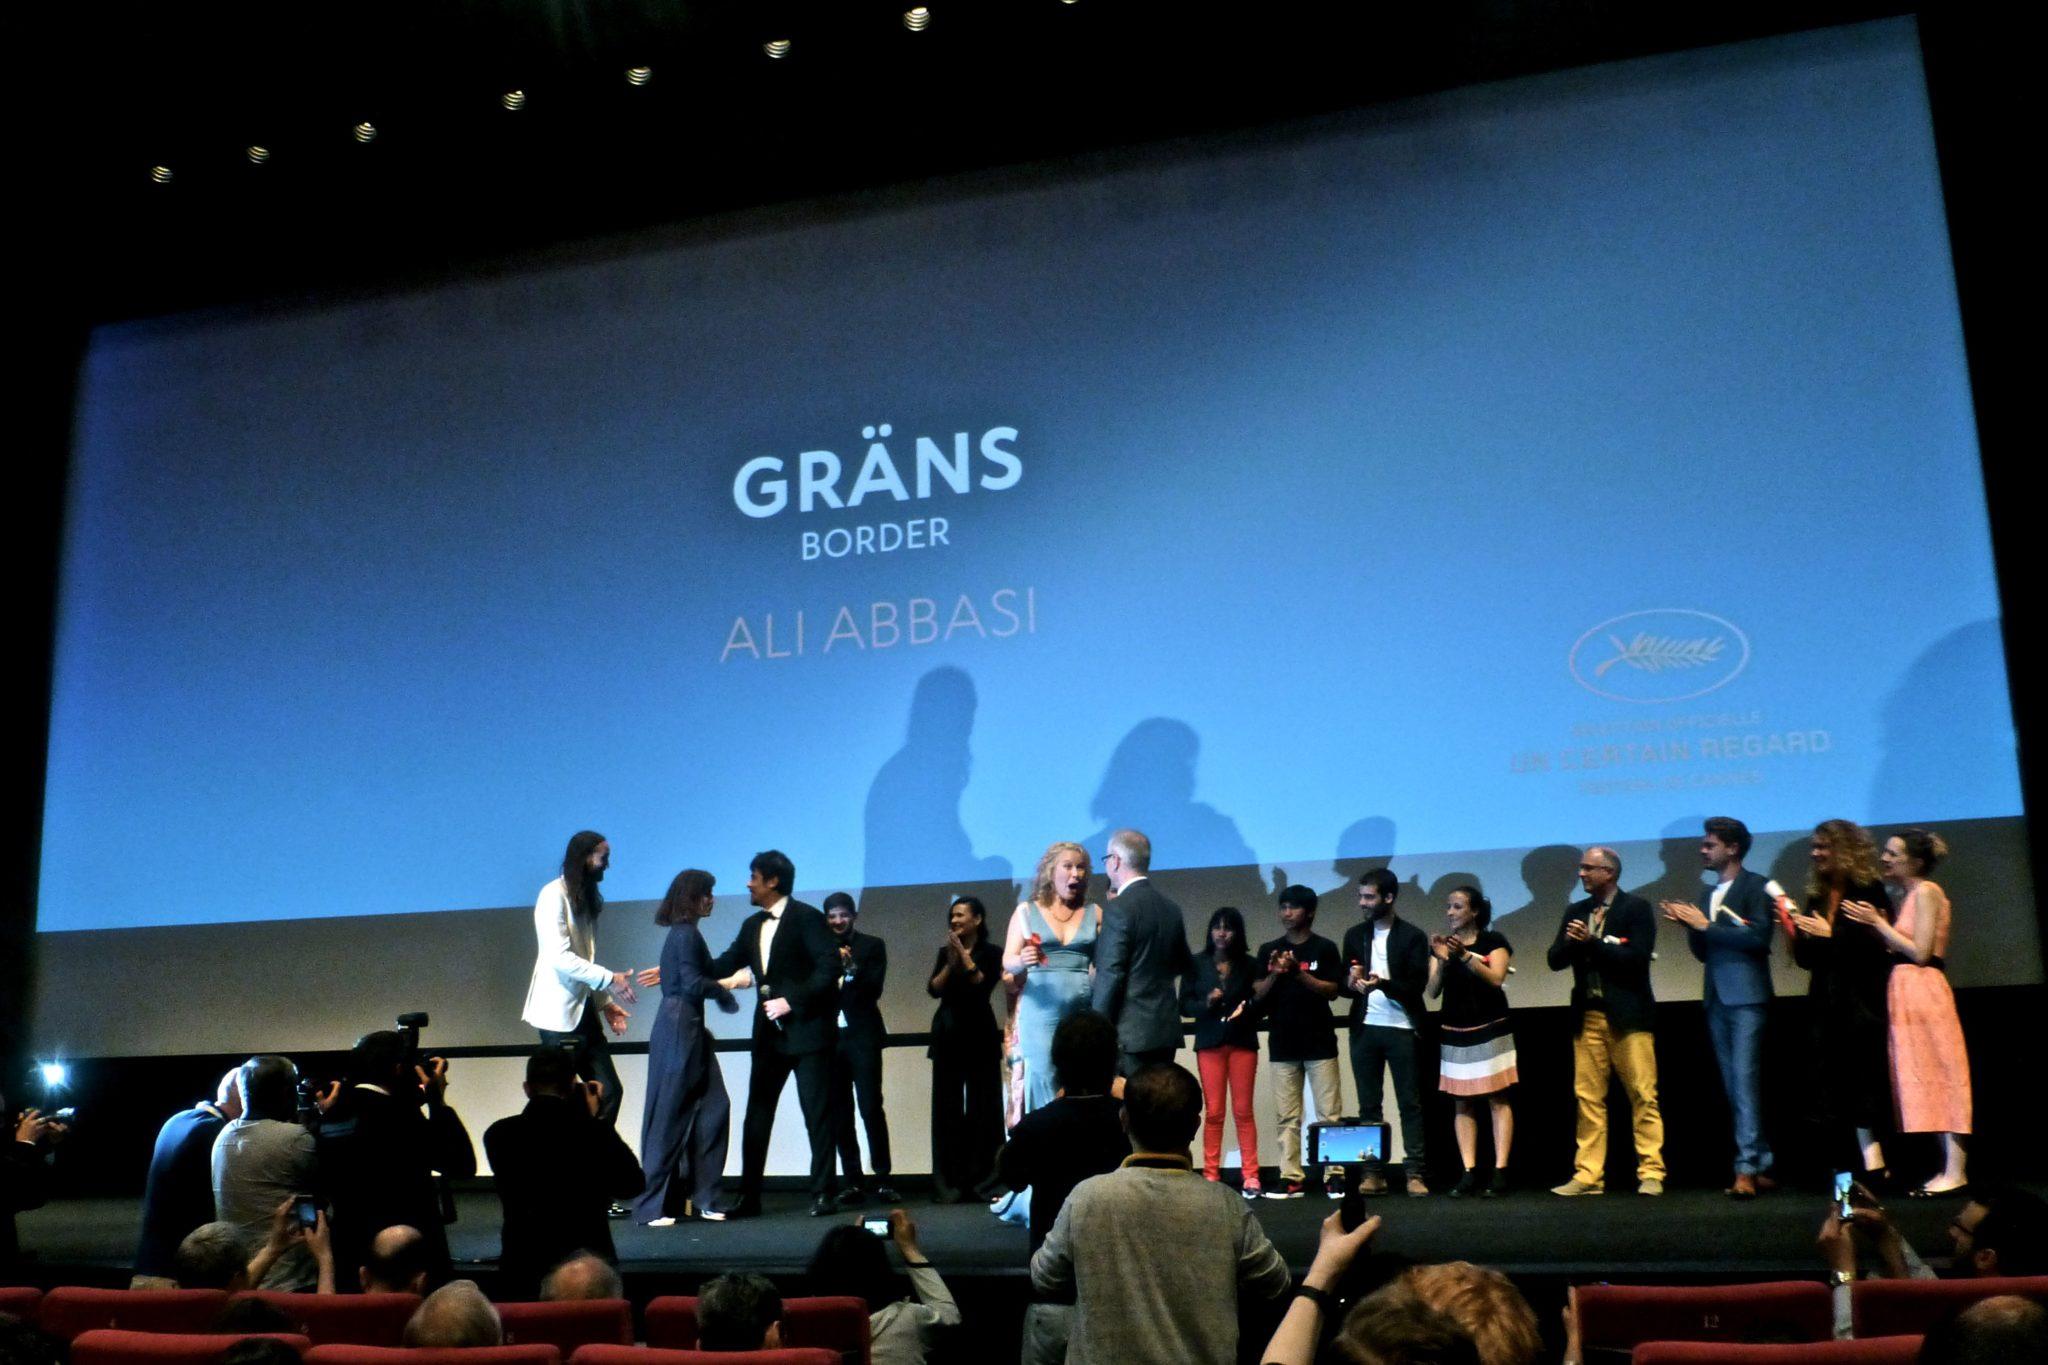 Grans (Border) wins Un Certain Regard